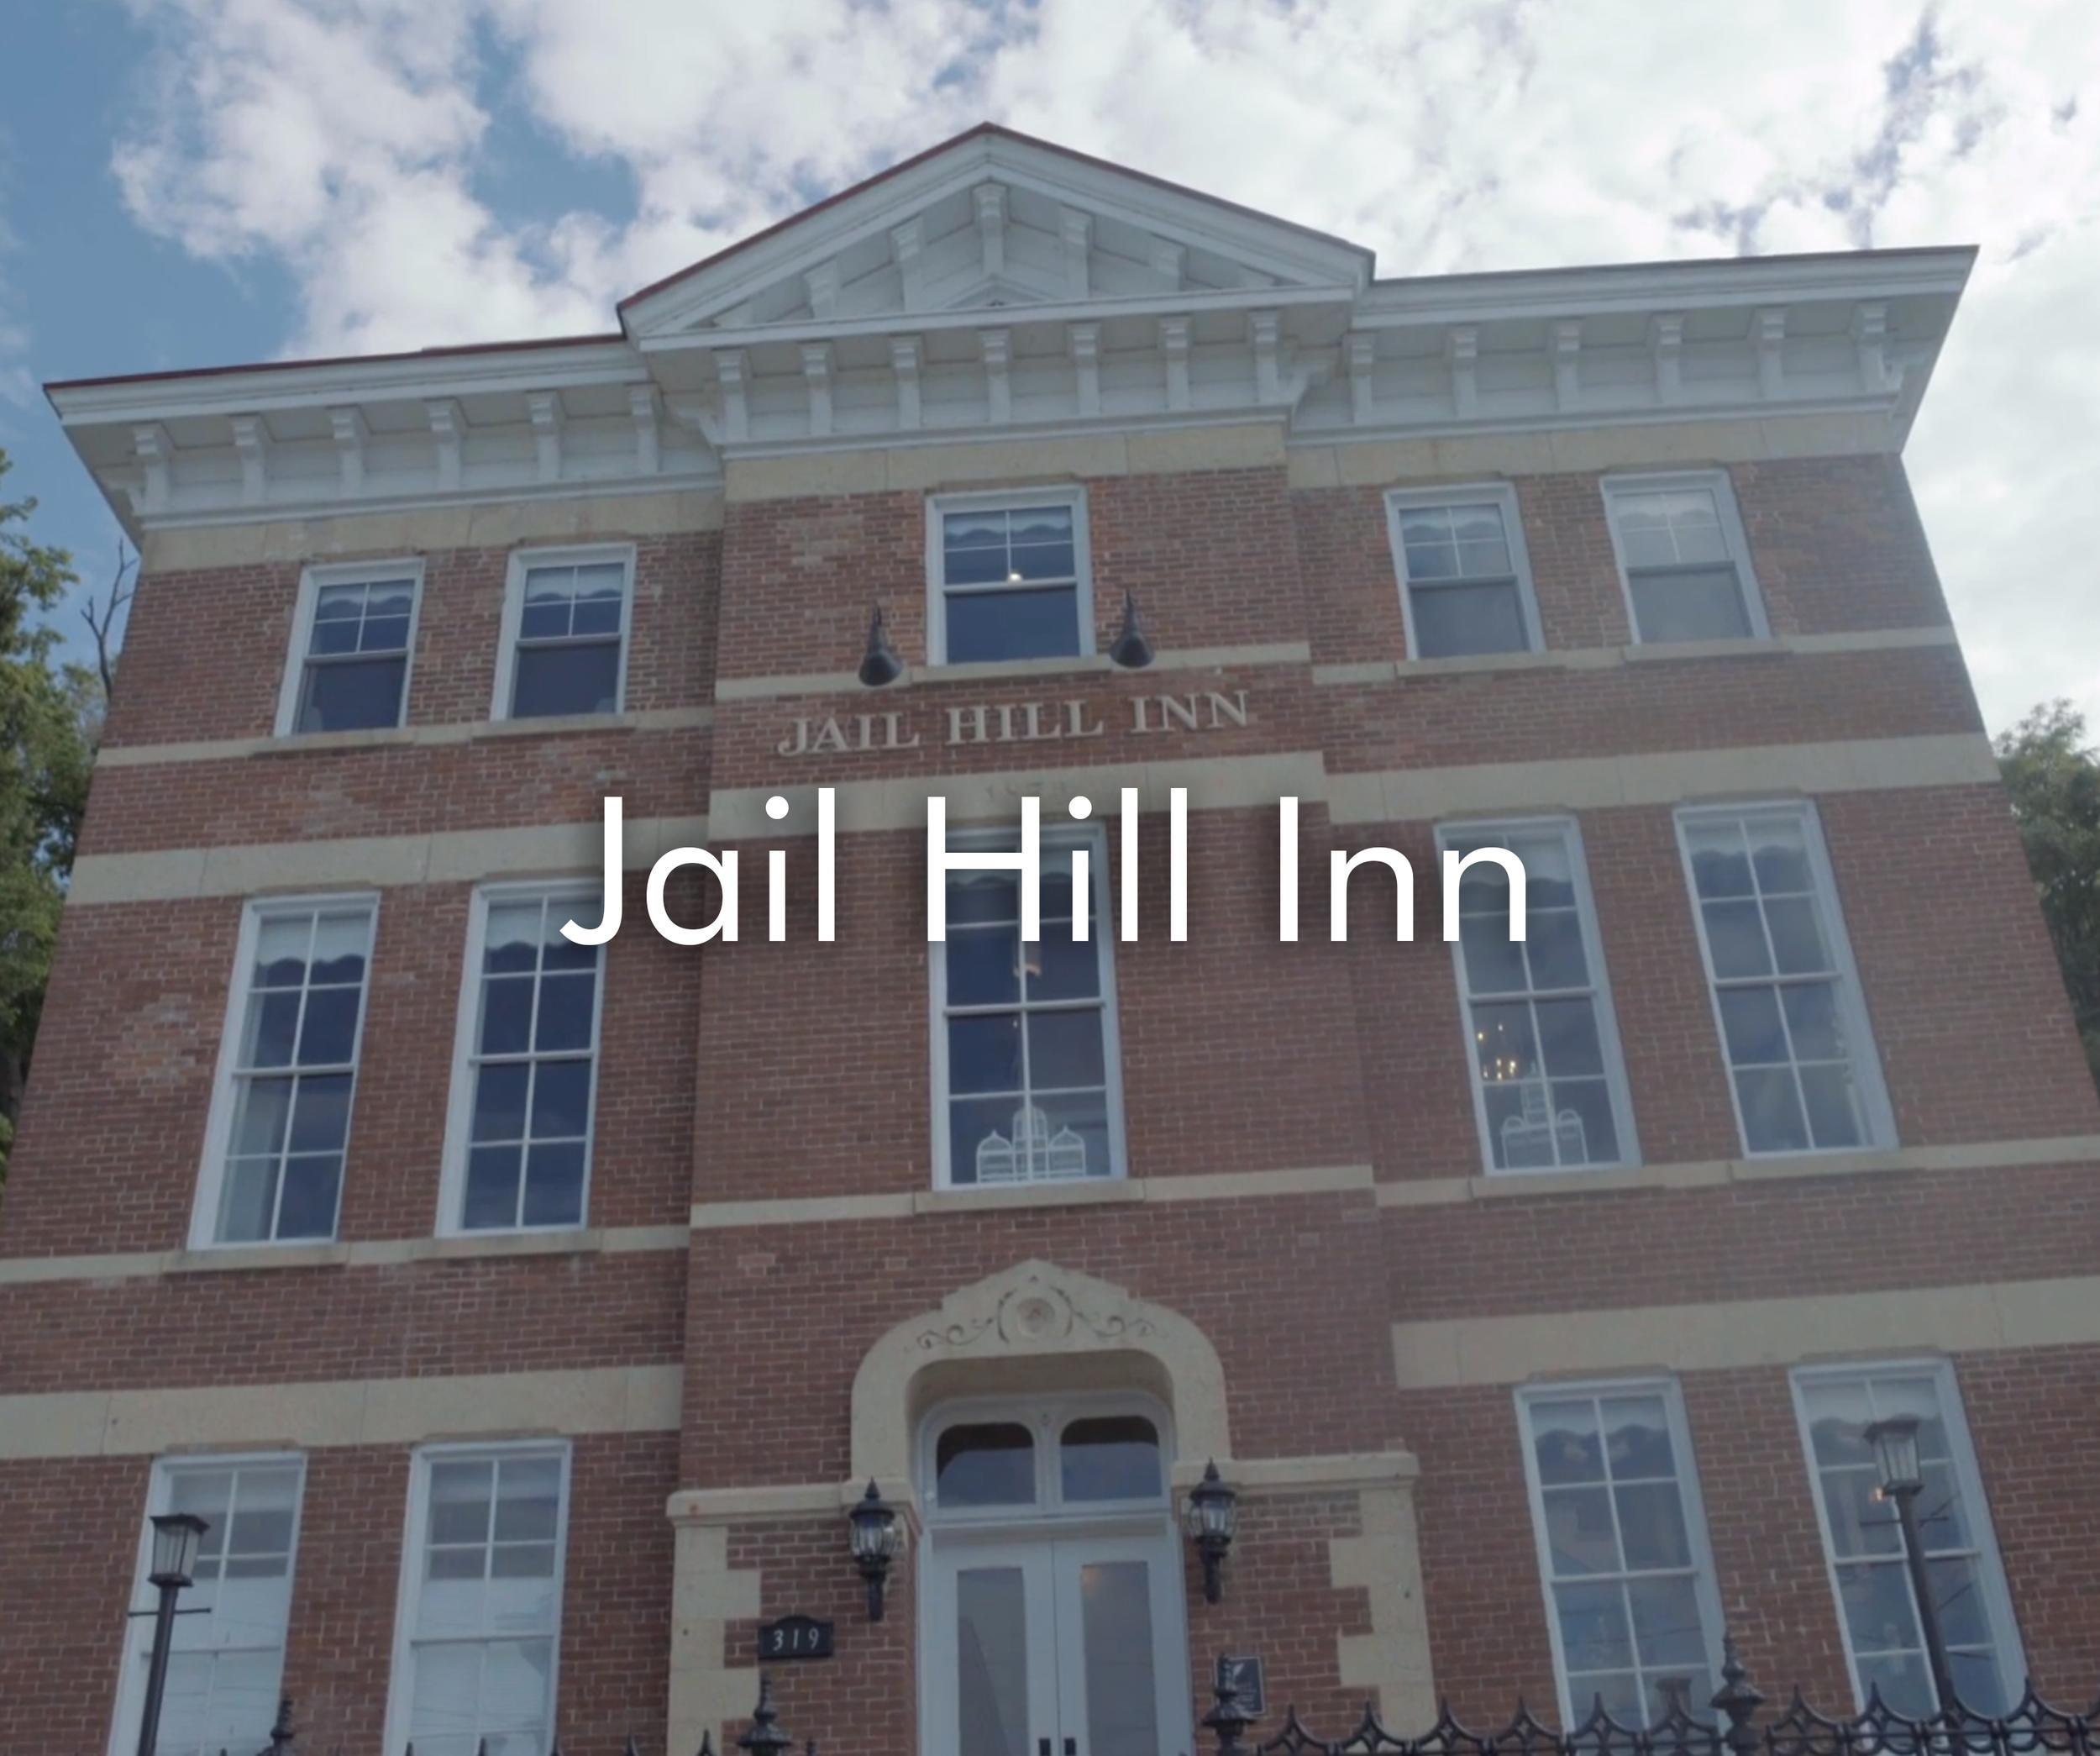 Jail Hill Inn Words.png